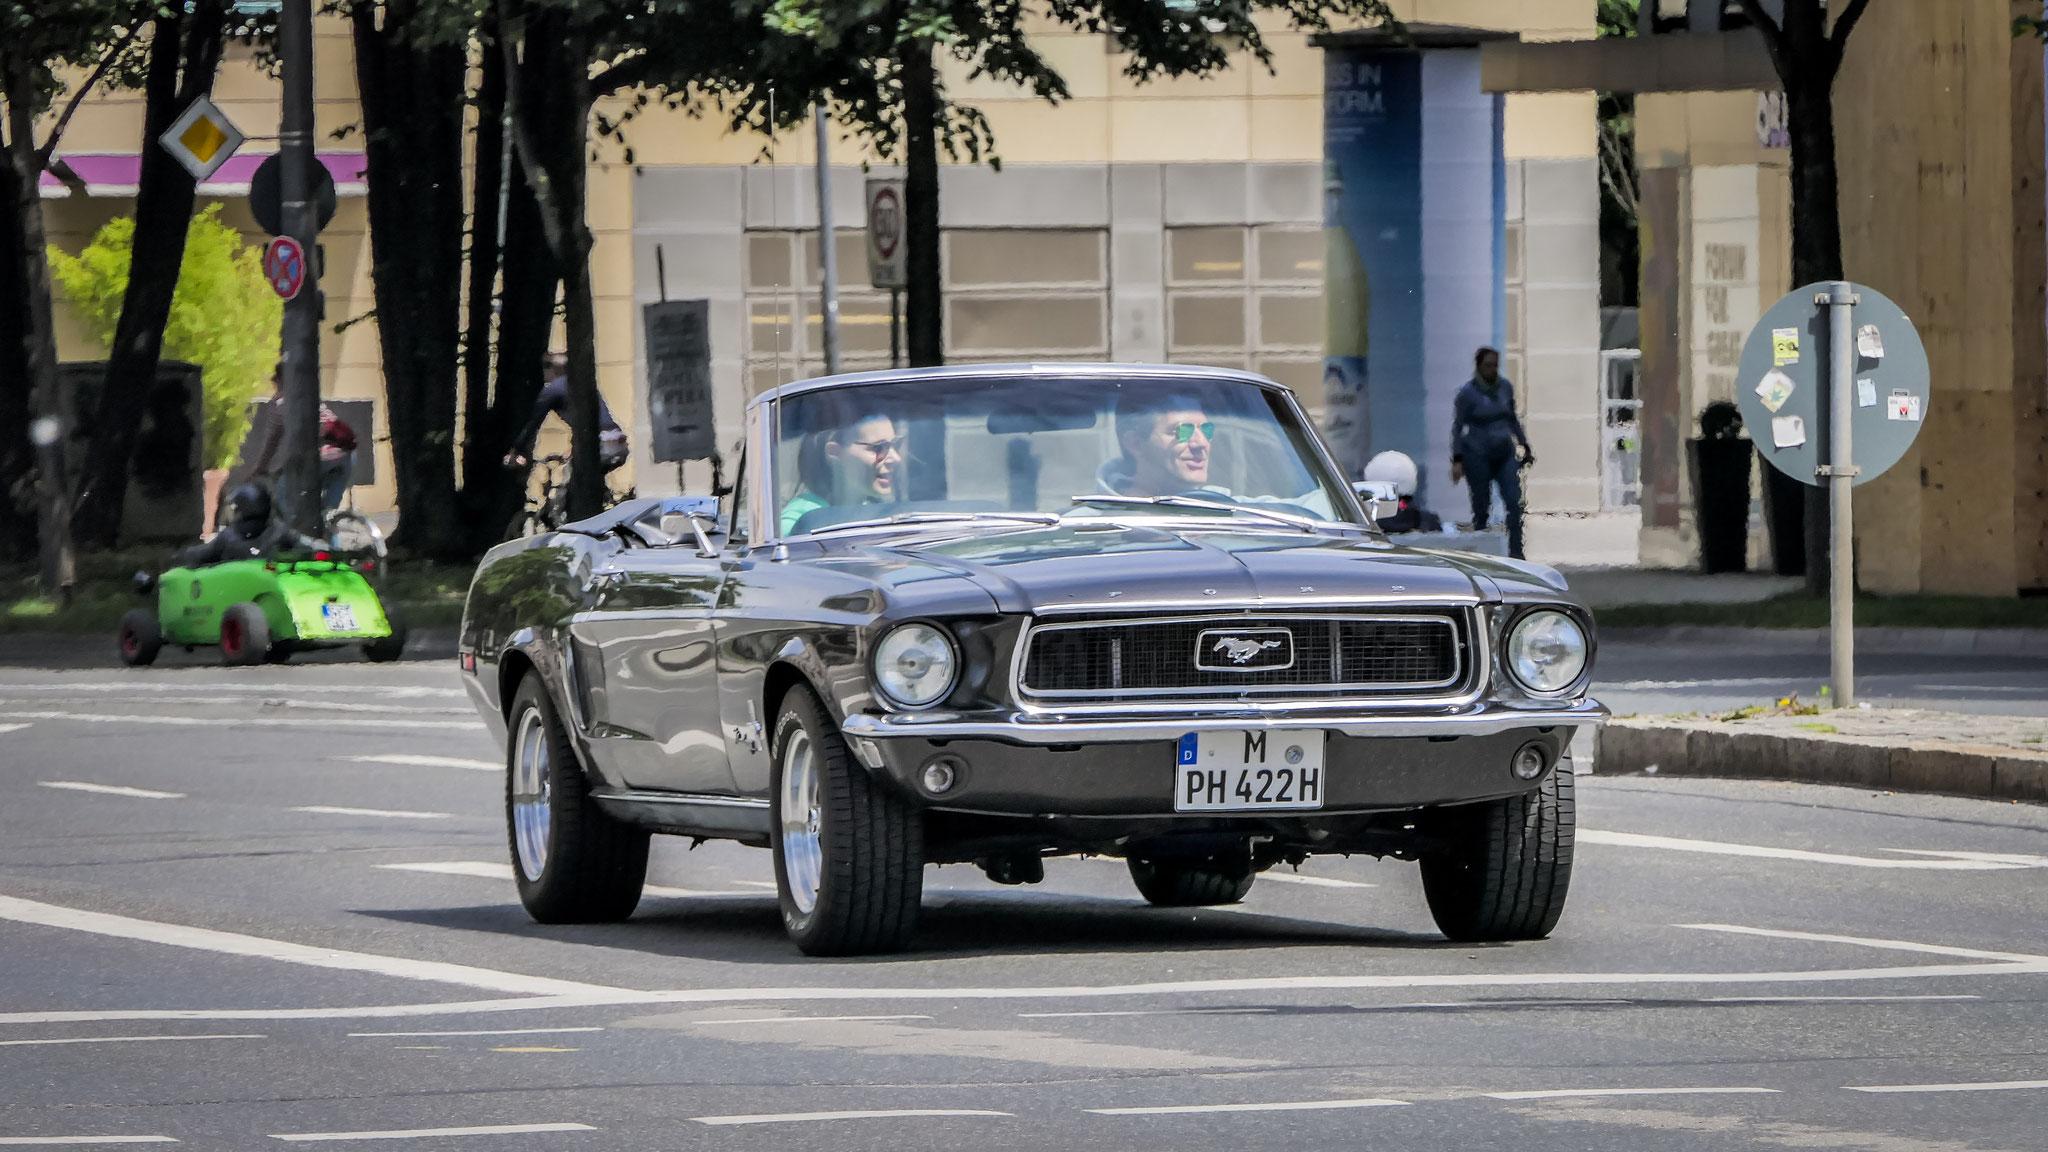 Mustang I - M-PH-422H